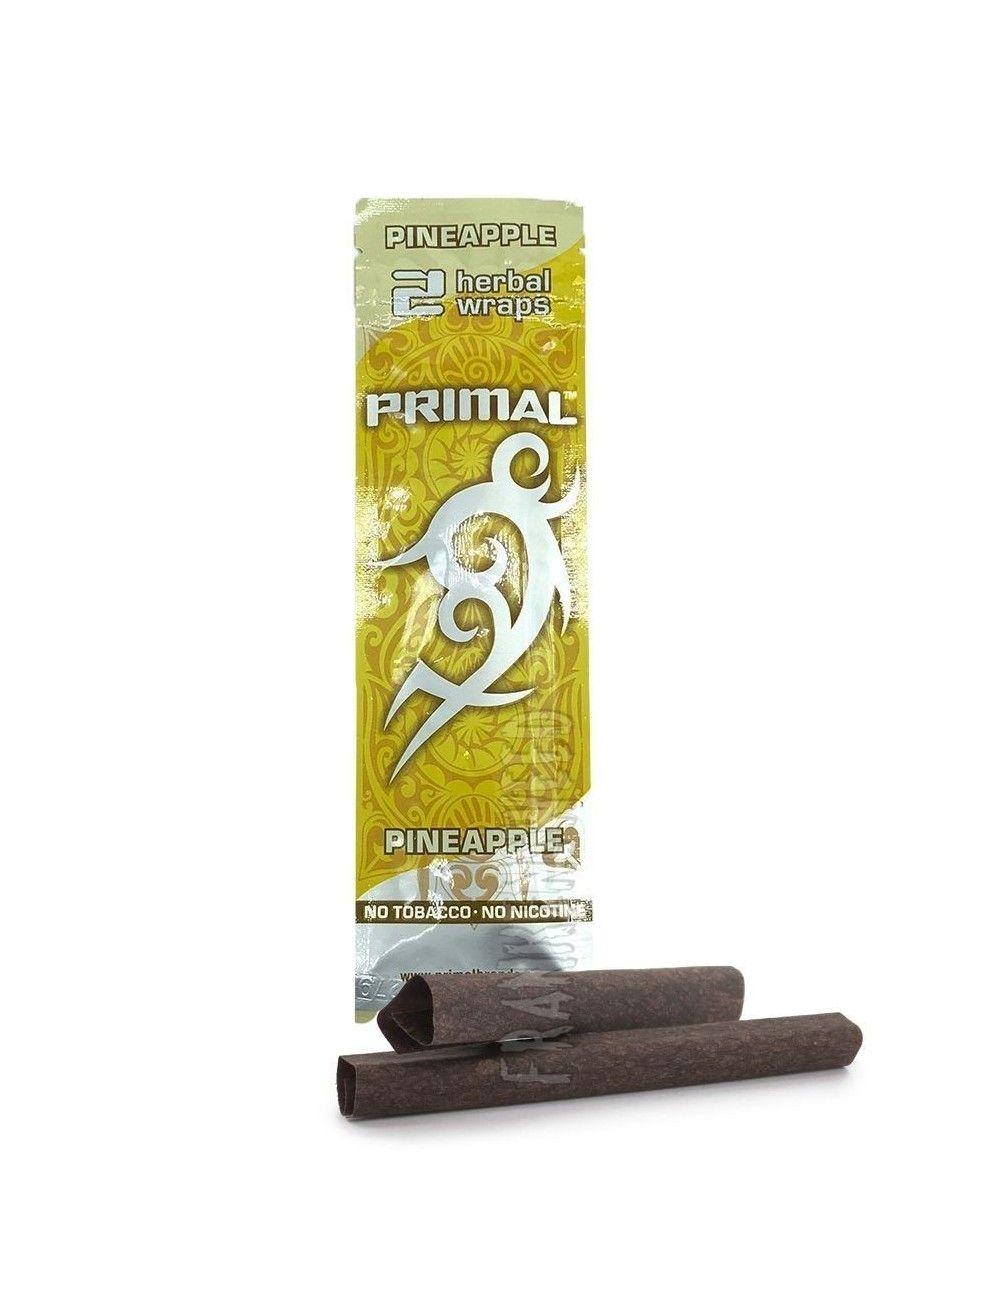 Primal Herbal Wraps - Pineapple